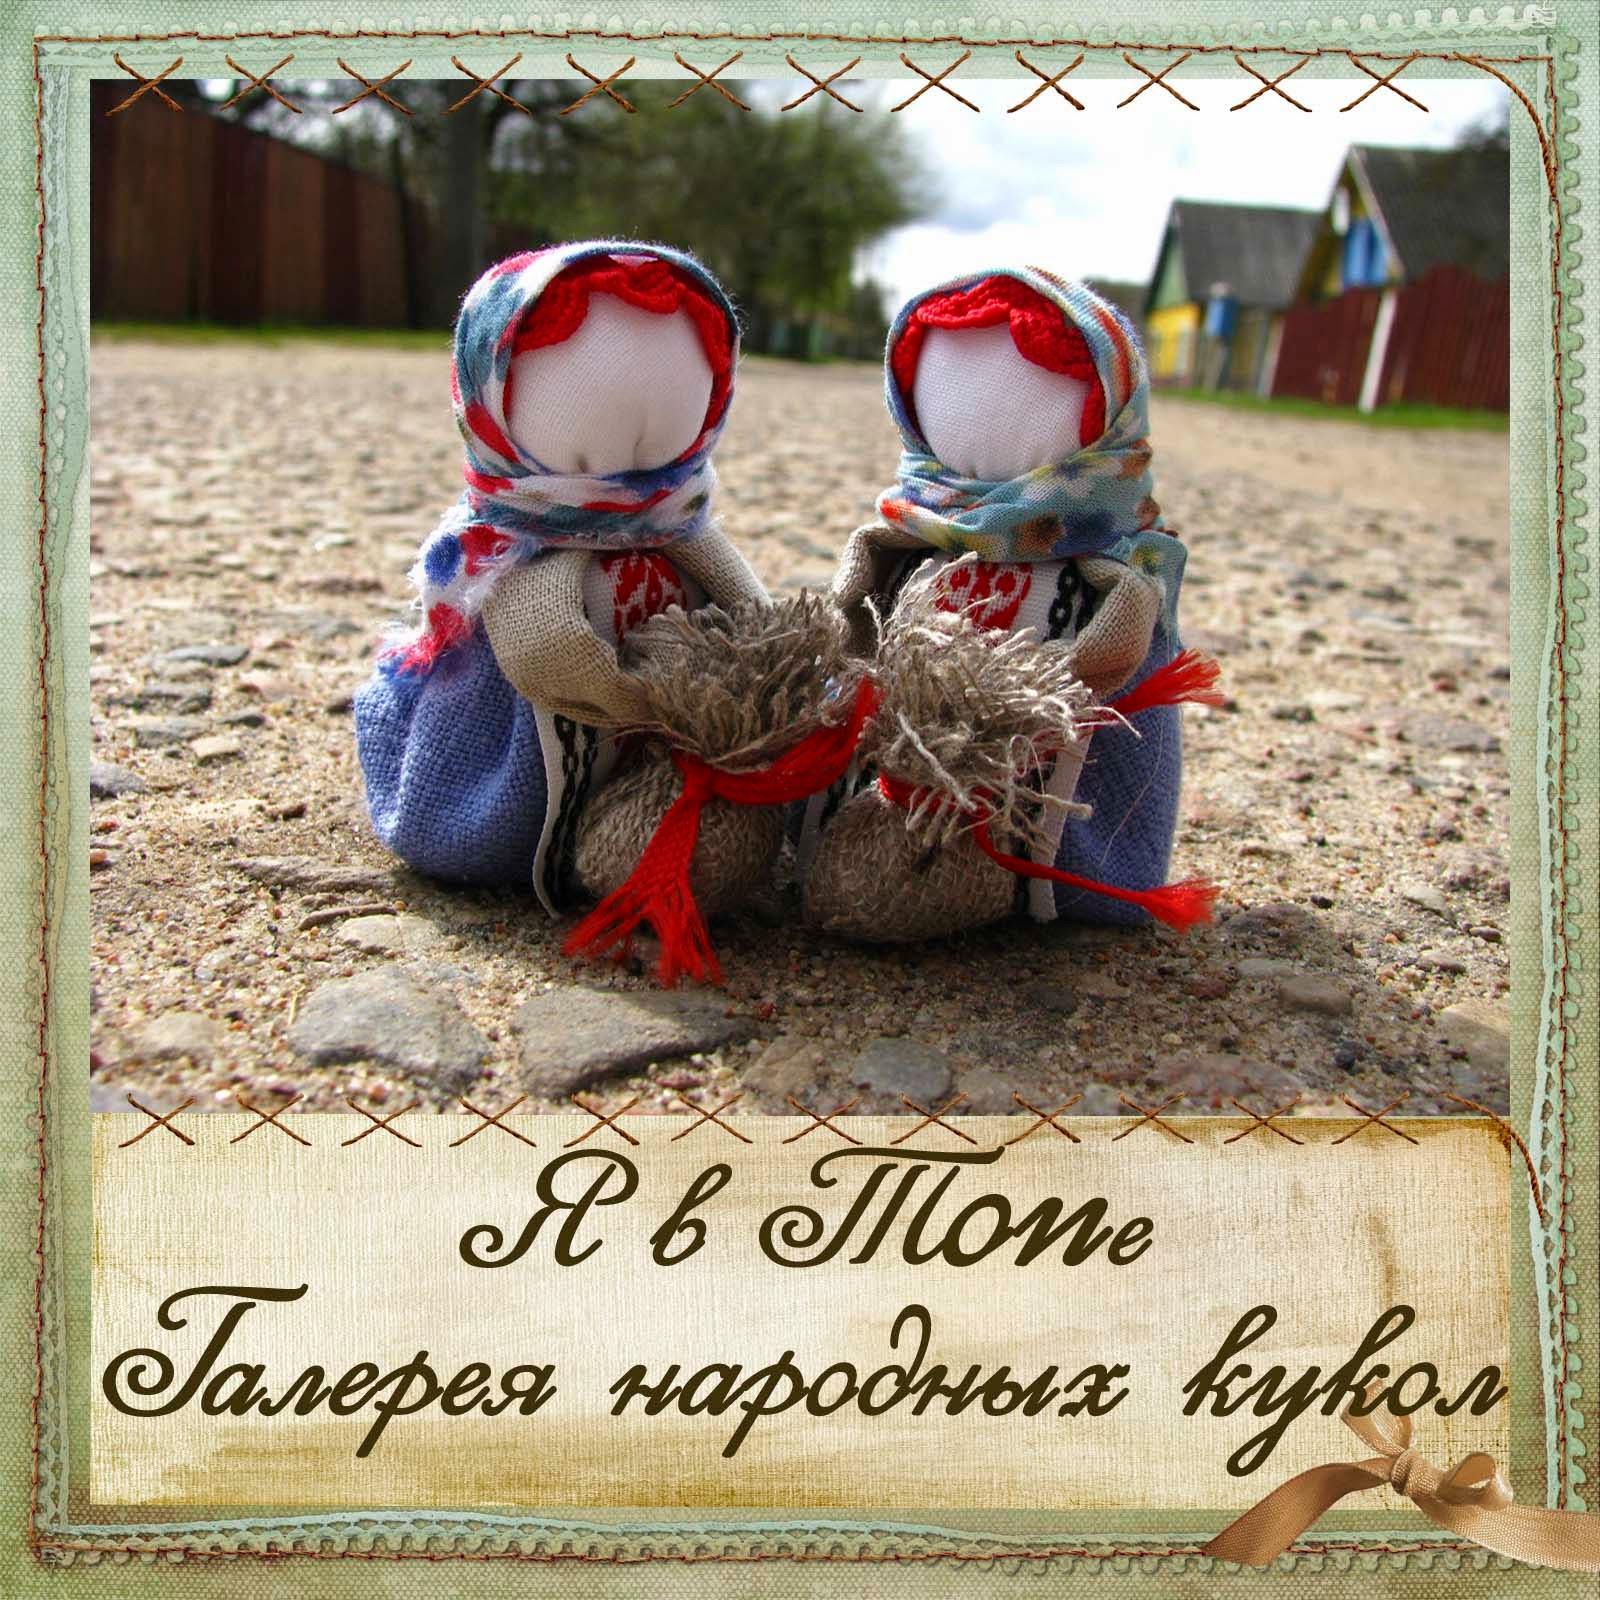 Галерея народных кукол оберегов